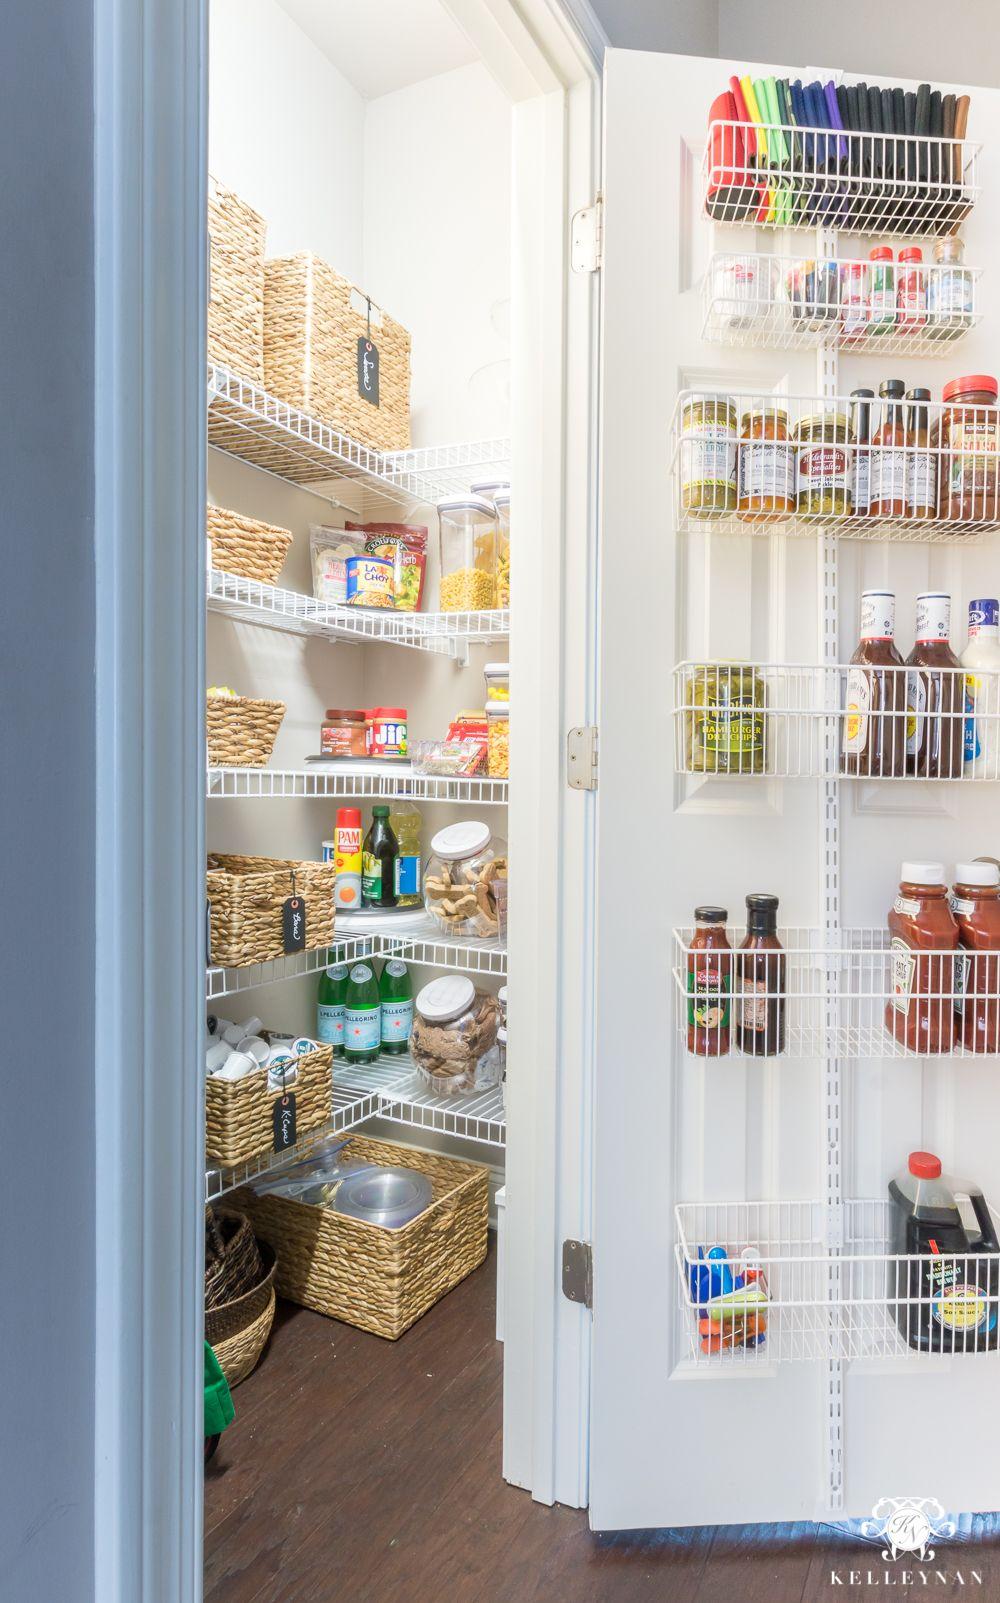 Organized pantry ideas for small reach-ins #organization ...